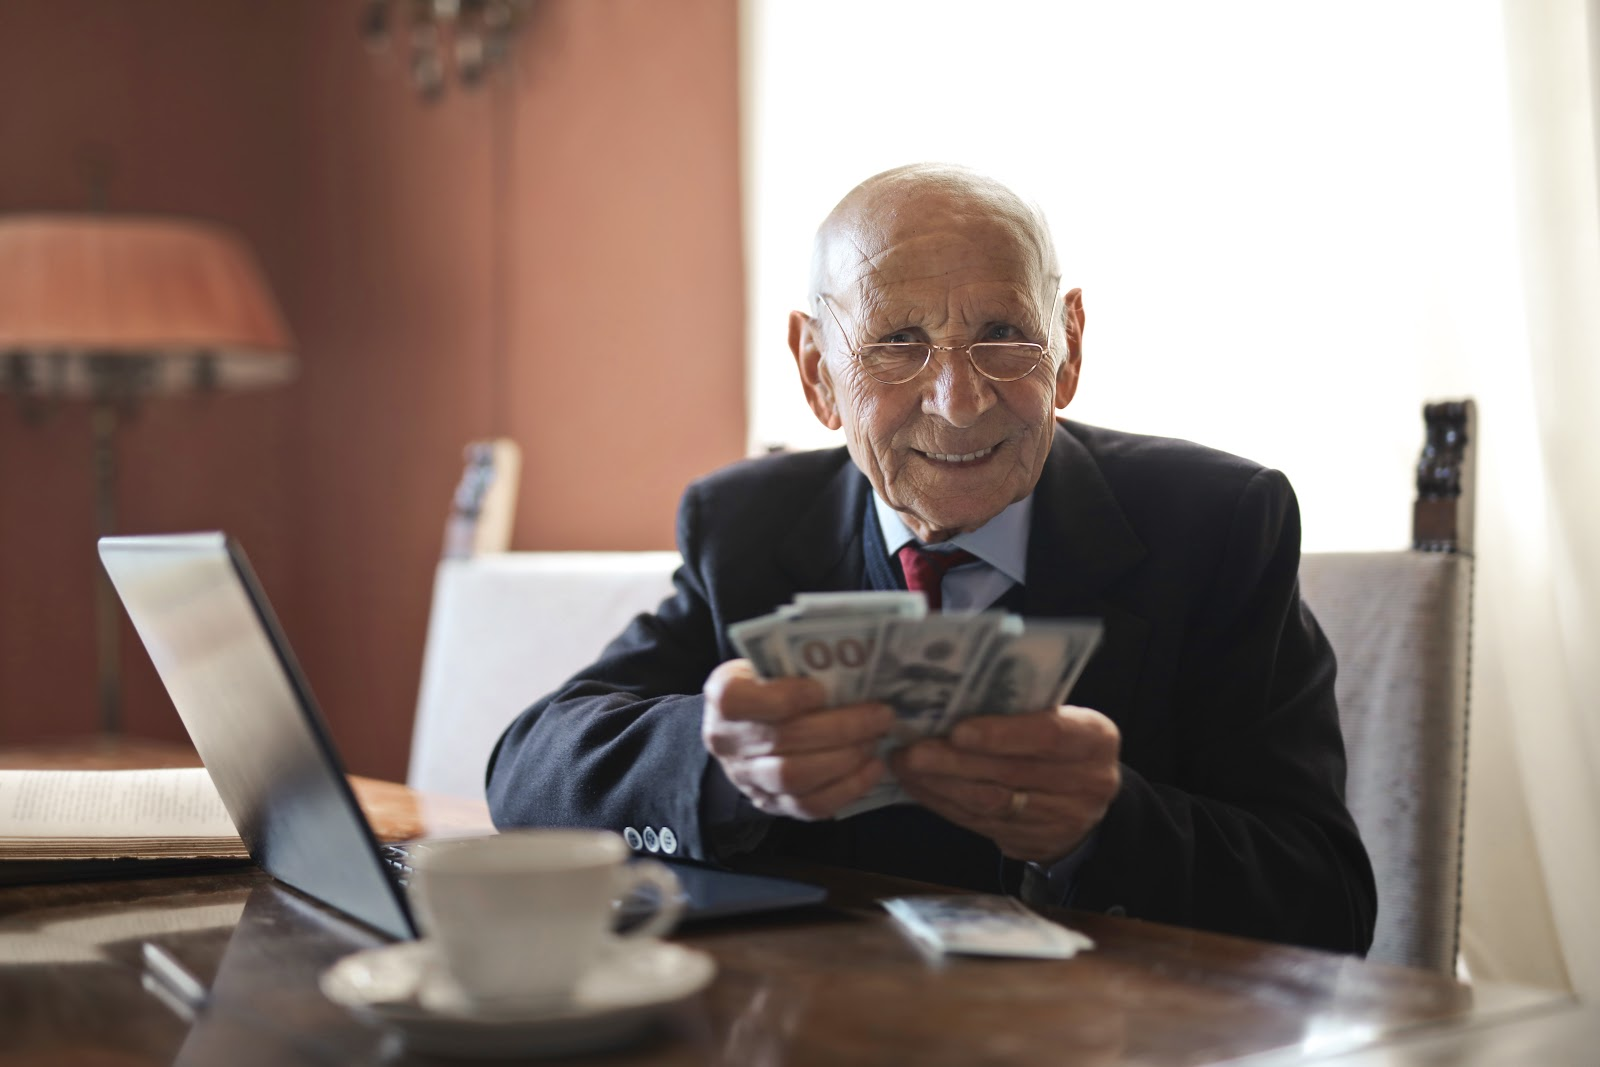 borrow on low-interest installment from lenders